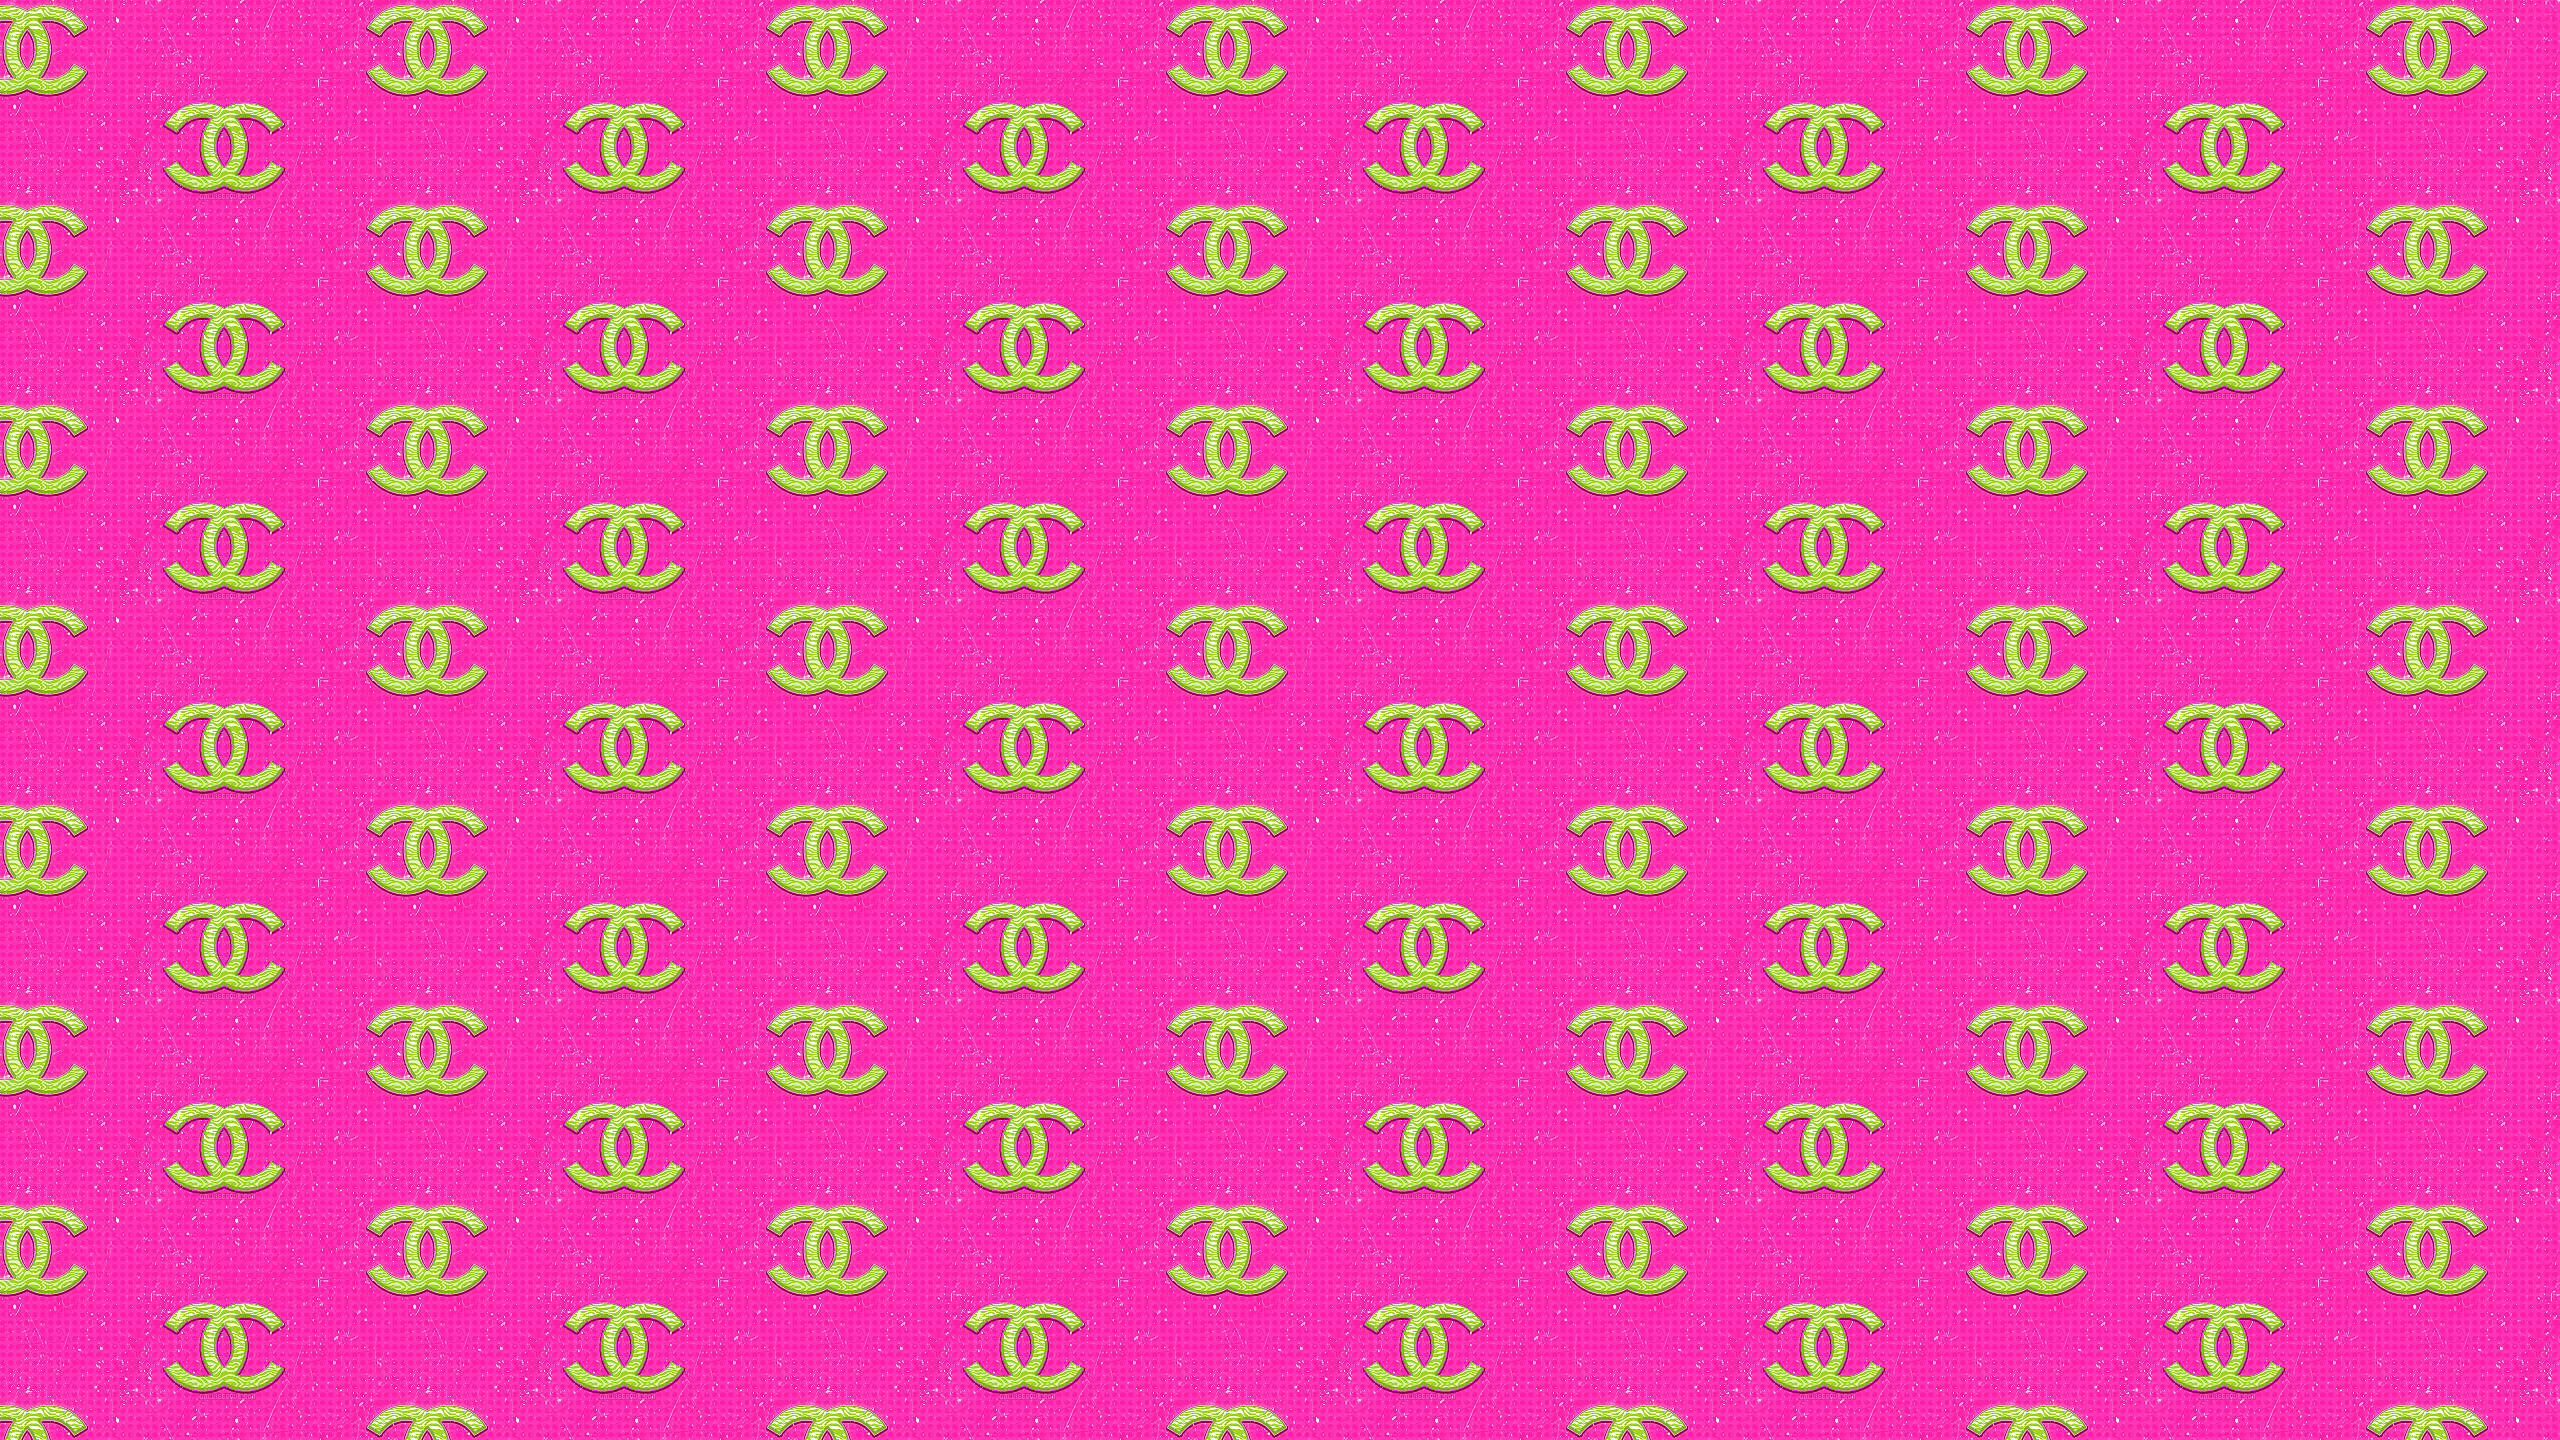 pink chanel logo pattern wallpaper 54425